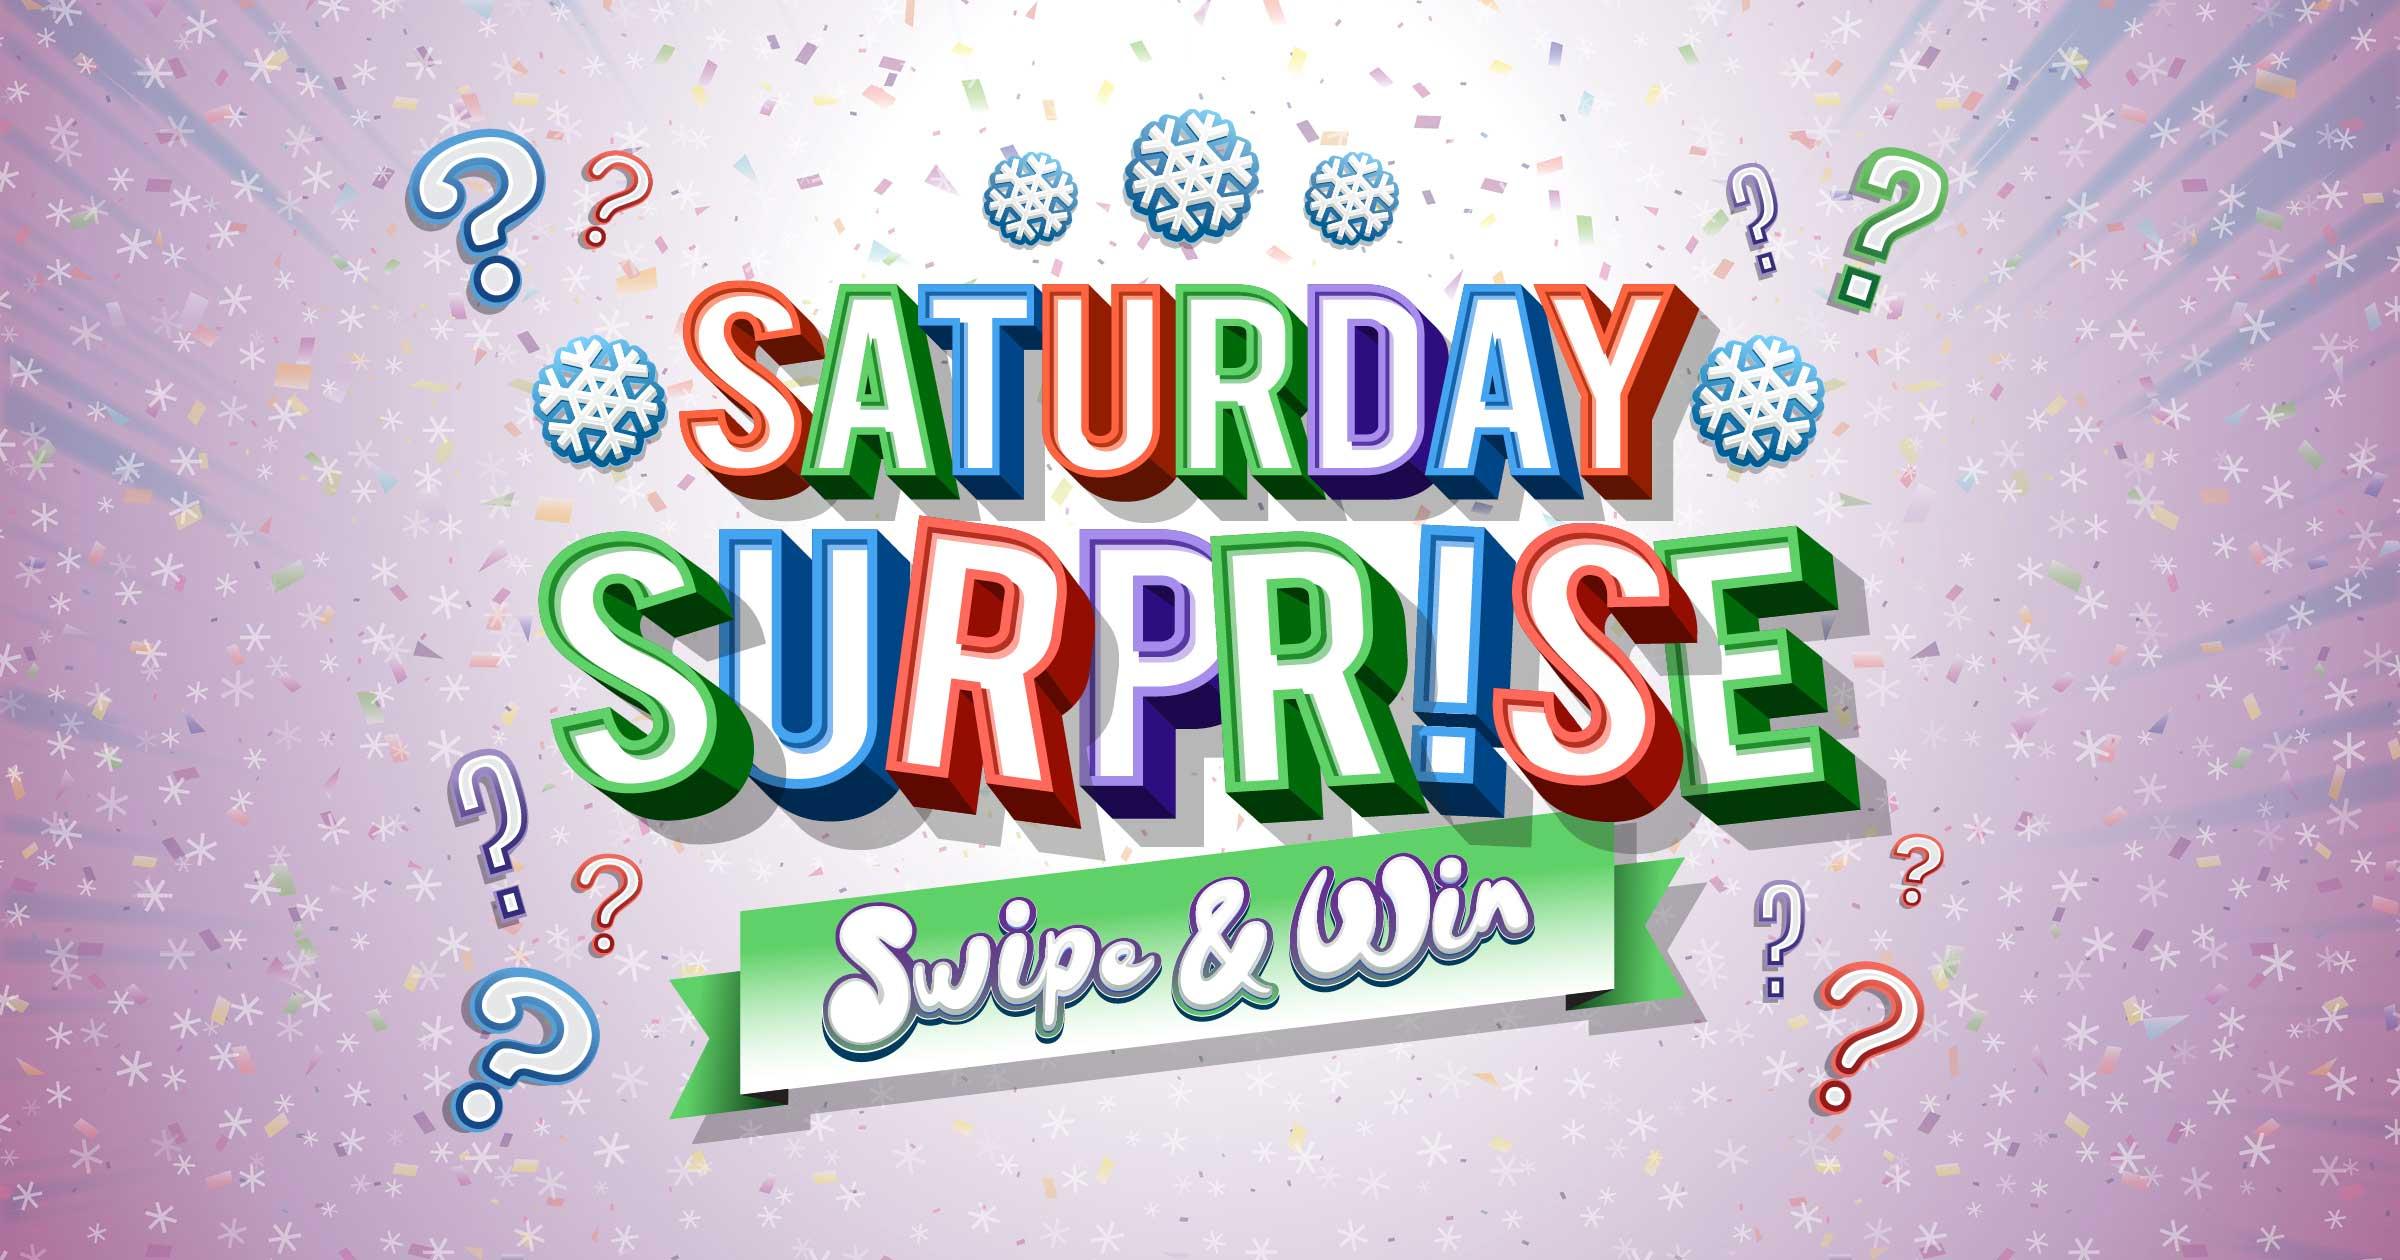 Saturday Surprise Swipe & Win